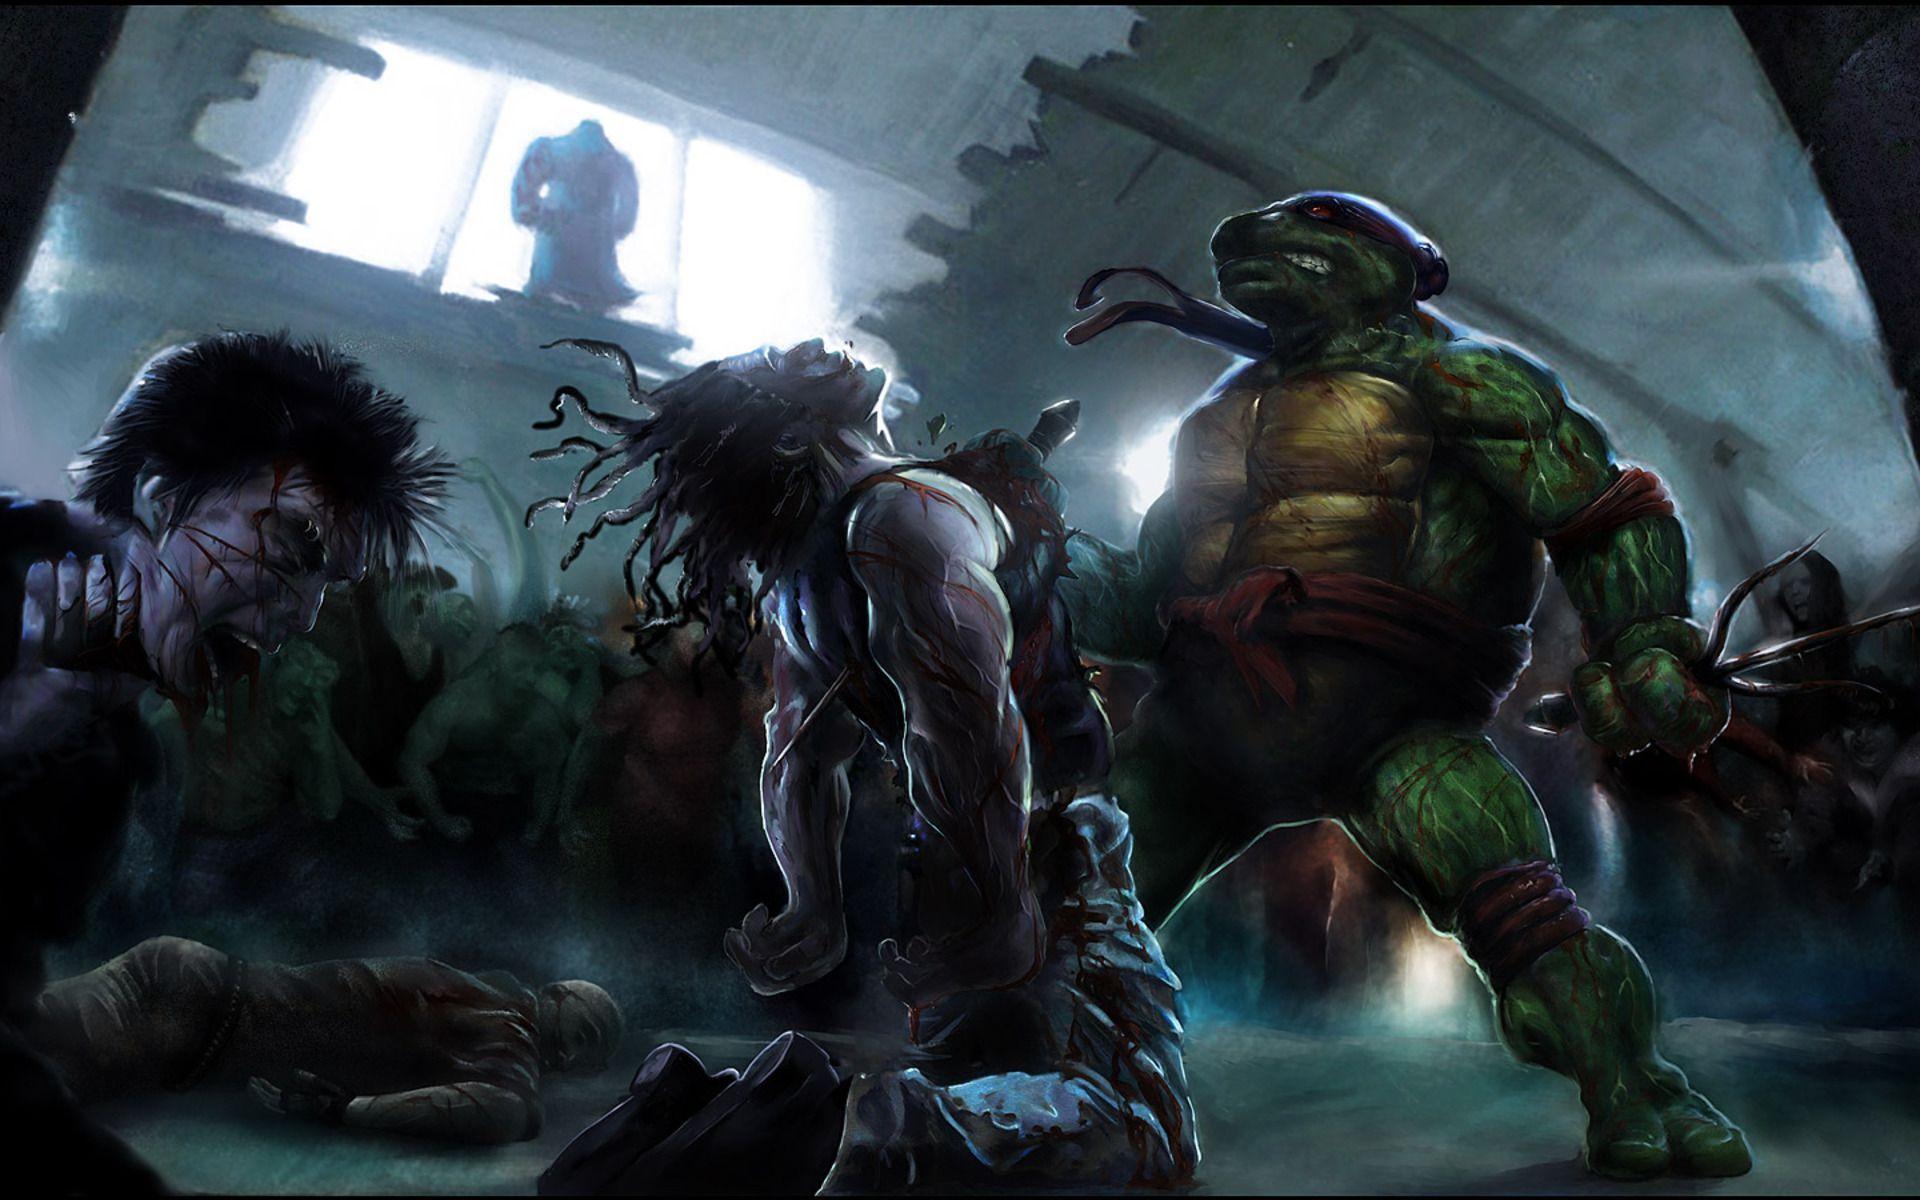 Free Download Teenage Mutant Ninja Turtles Wallpaper Hd Background